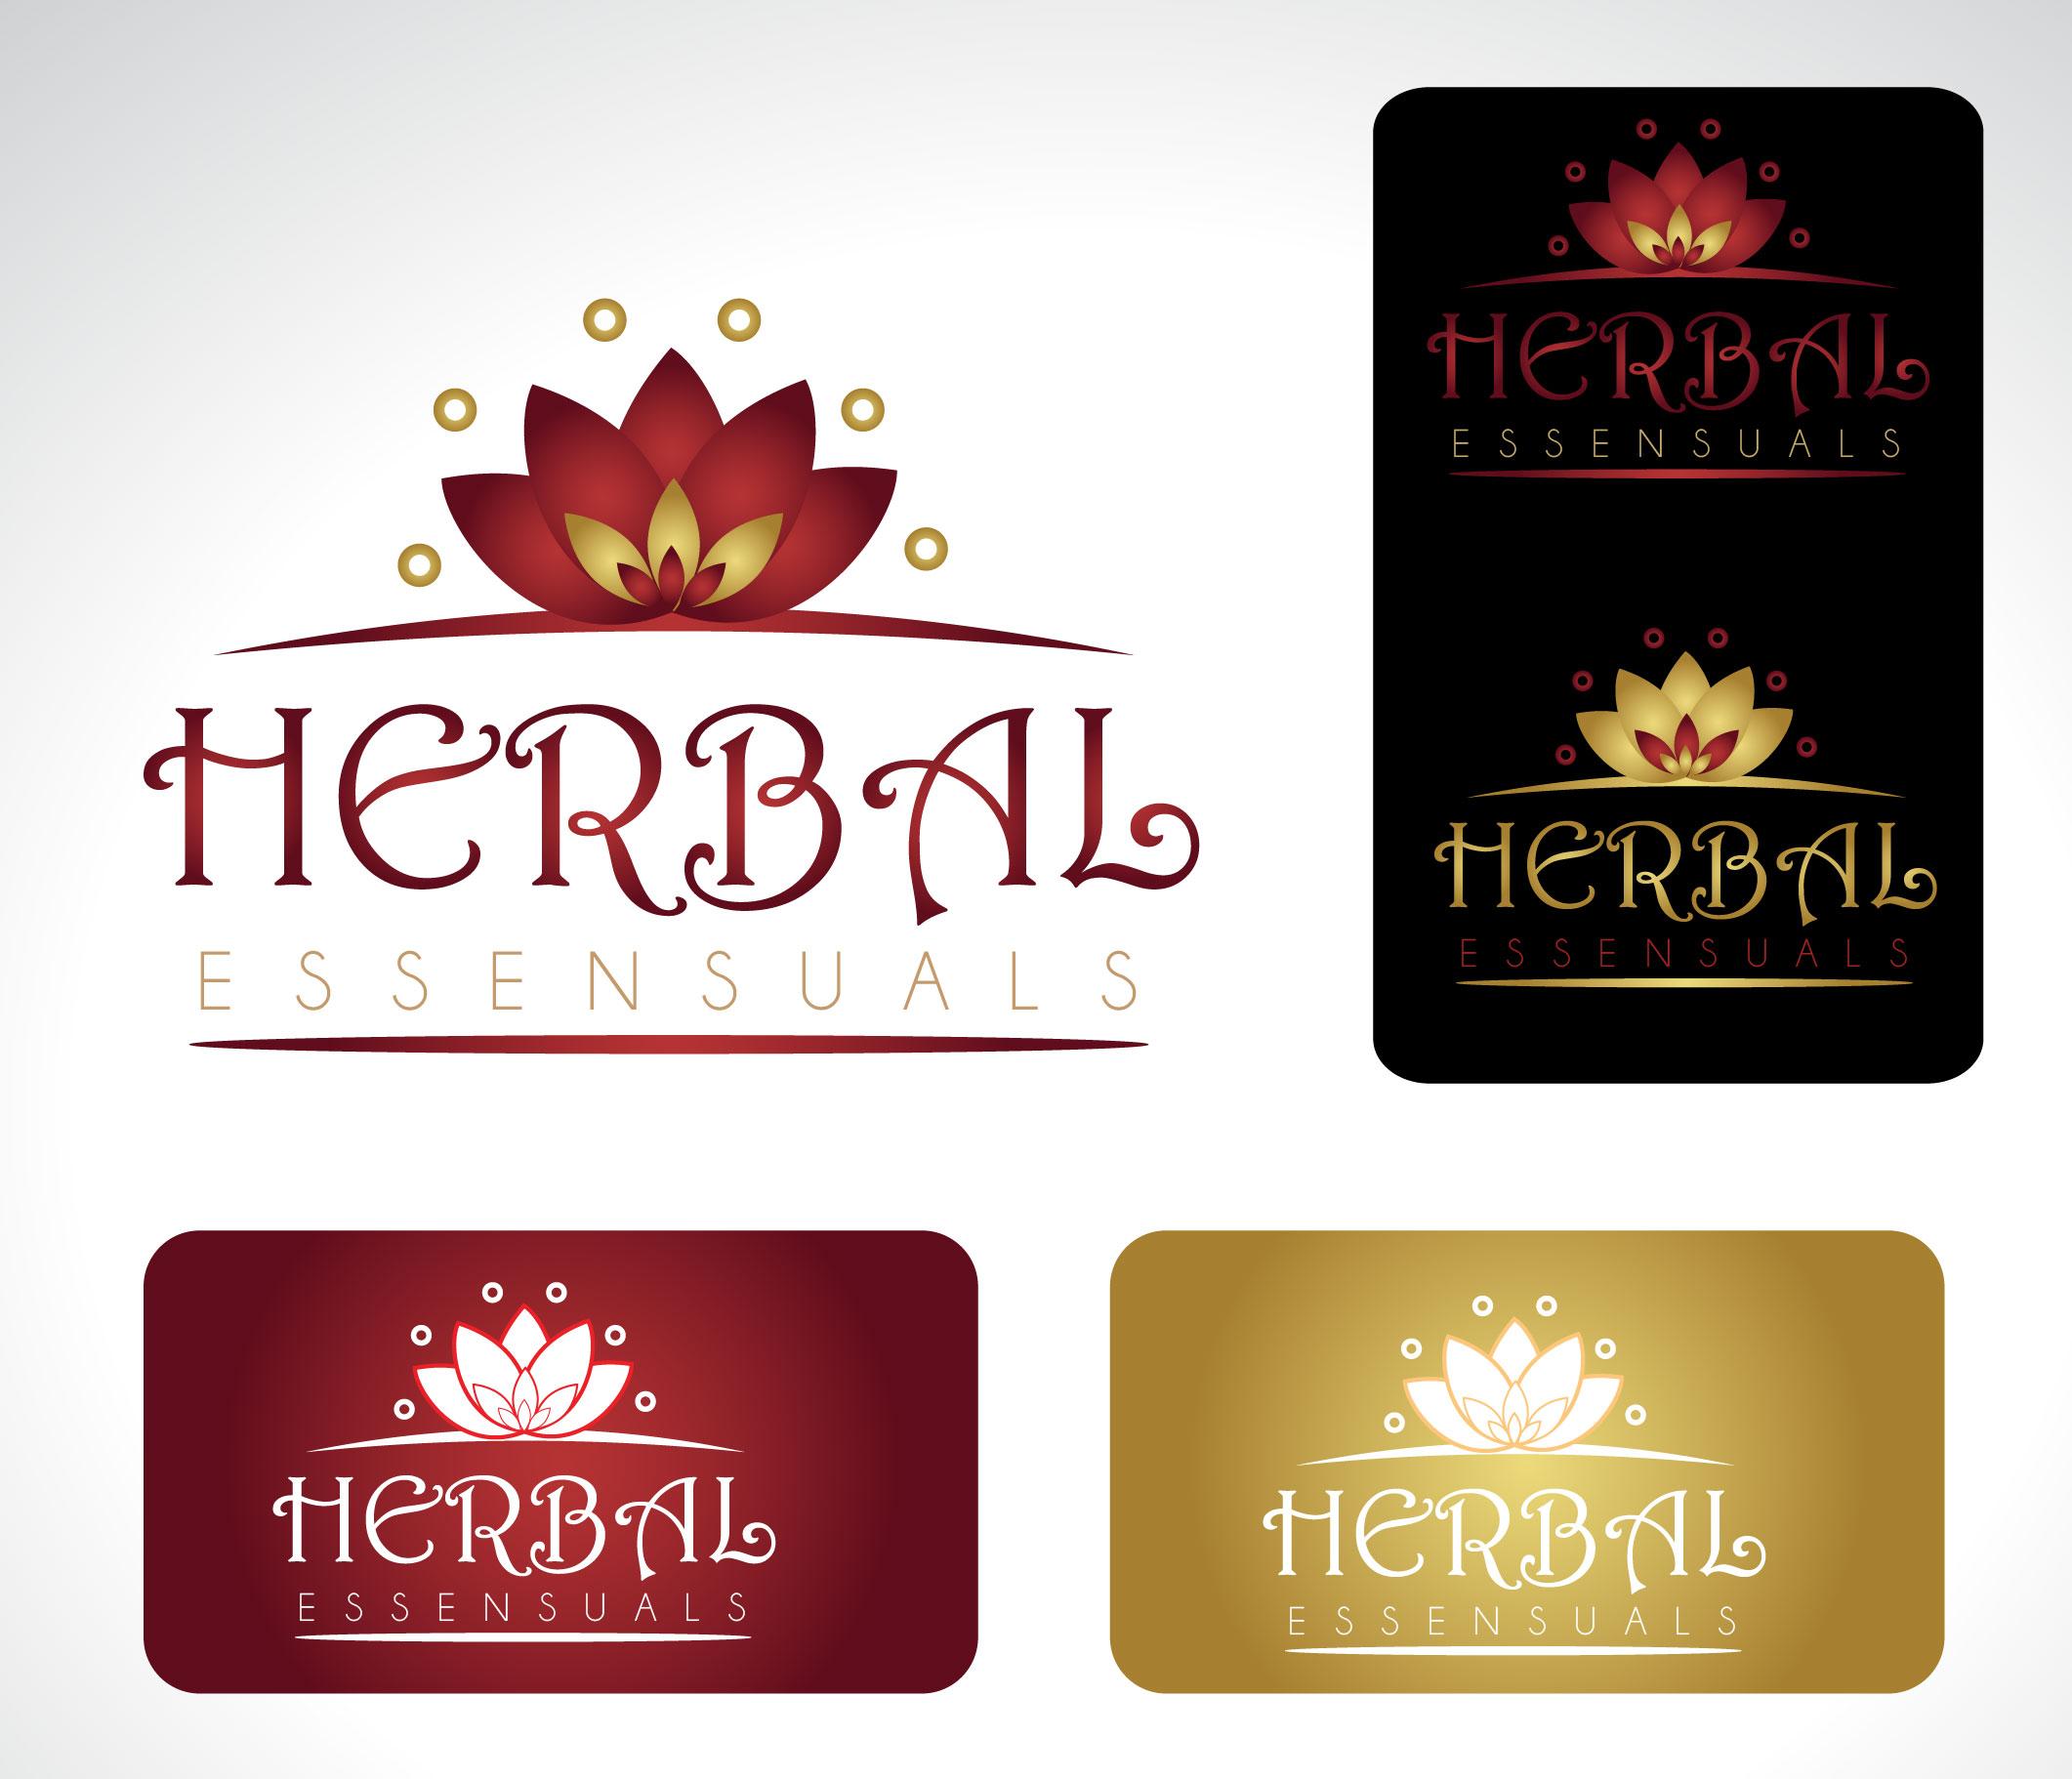 Logo Design by Darina Dimitrova - Entry No. 91 in the Logo Design Contest Captivating Logo Design for Herbal Essensuals.